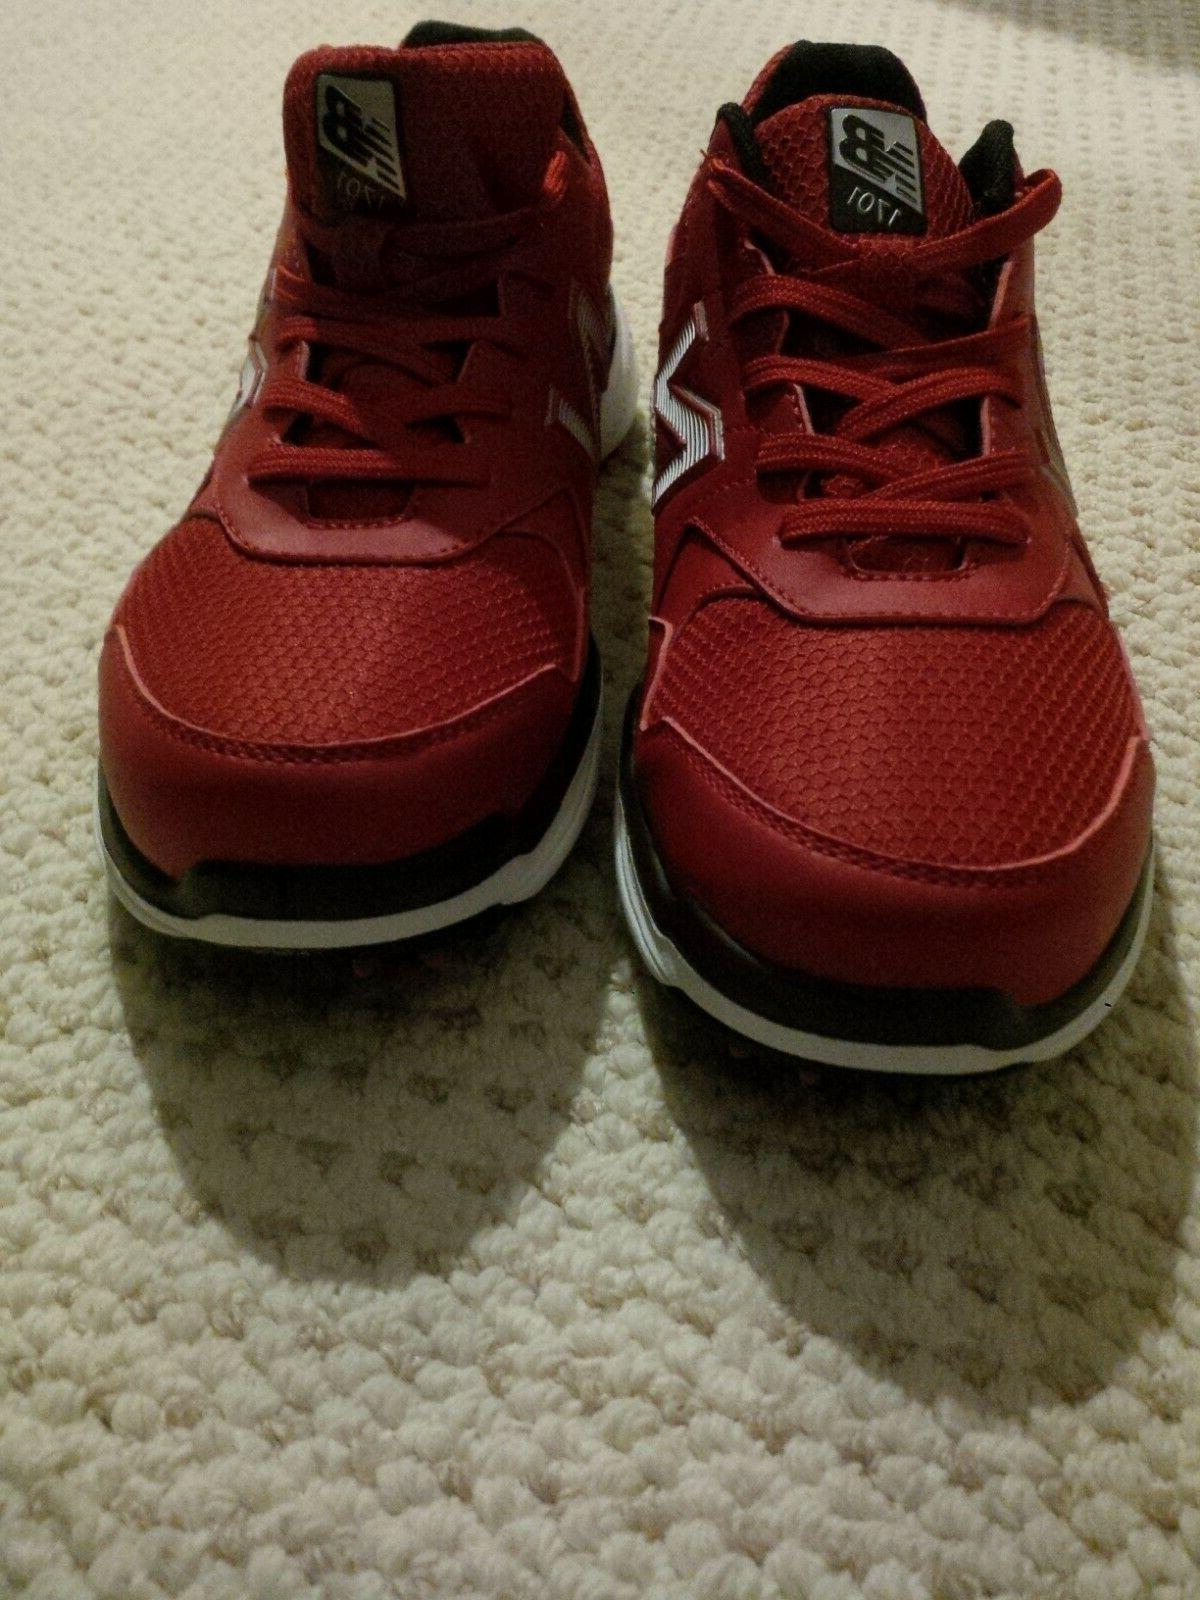 New Balance Men's Golf Shoe Size